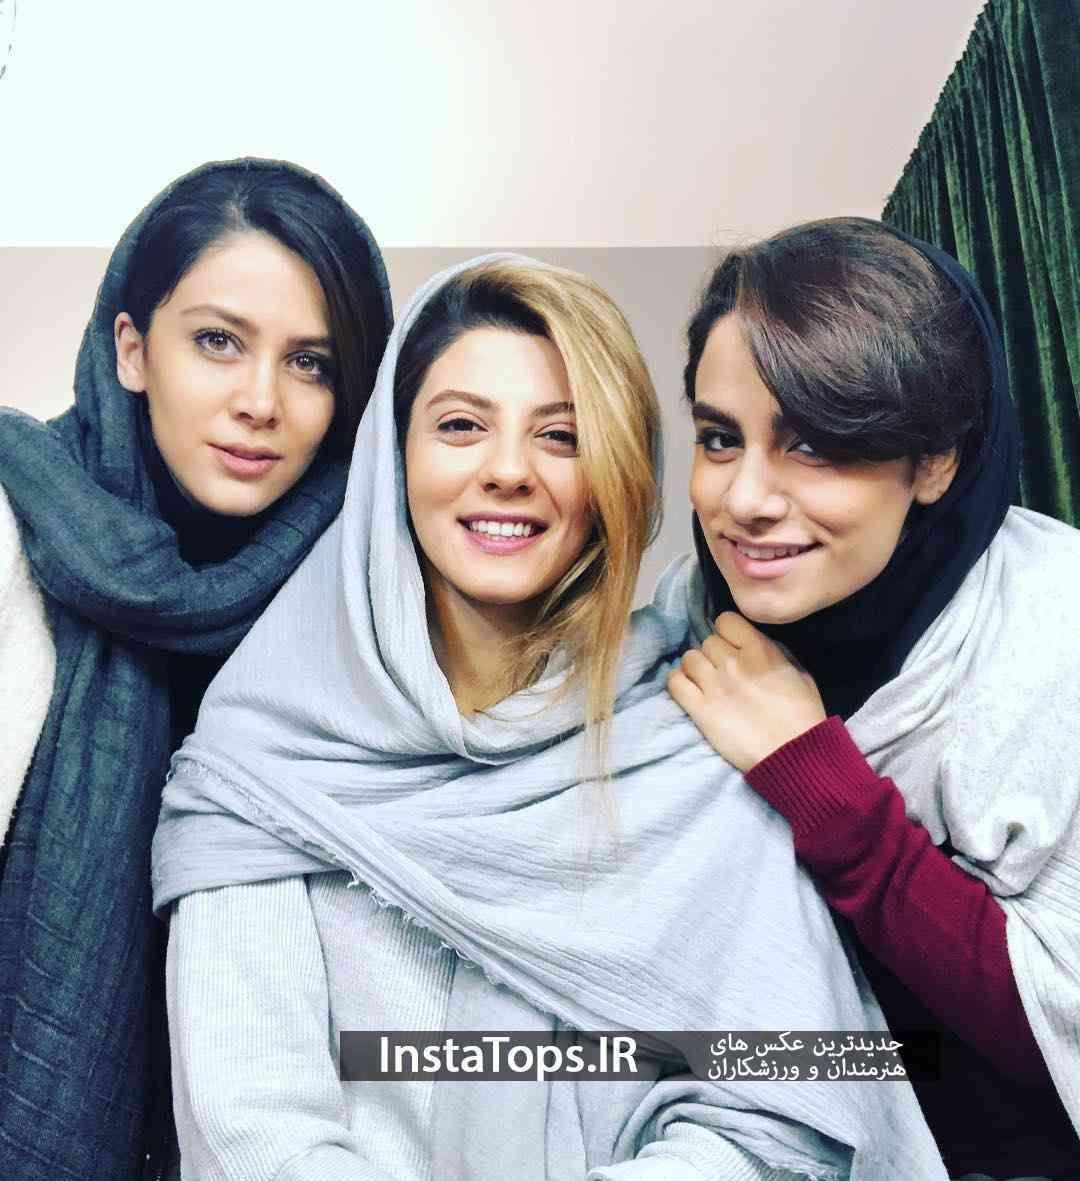 عکس مهسا طهماسبي و دوستانش Persian Fashion Persian Girls Actors